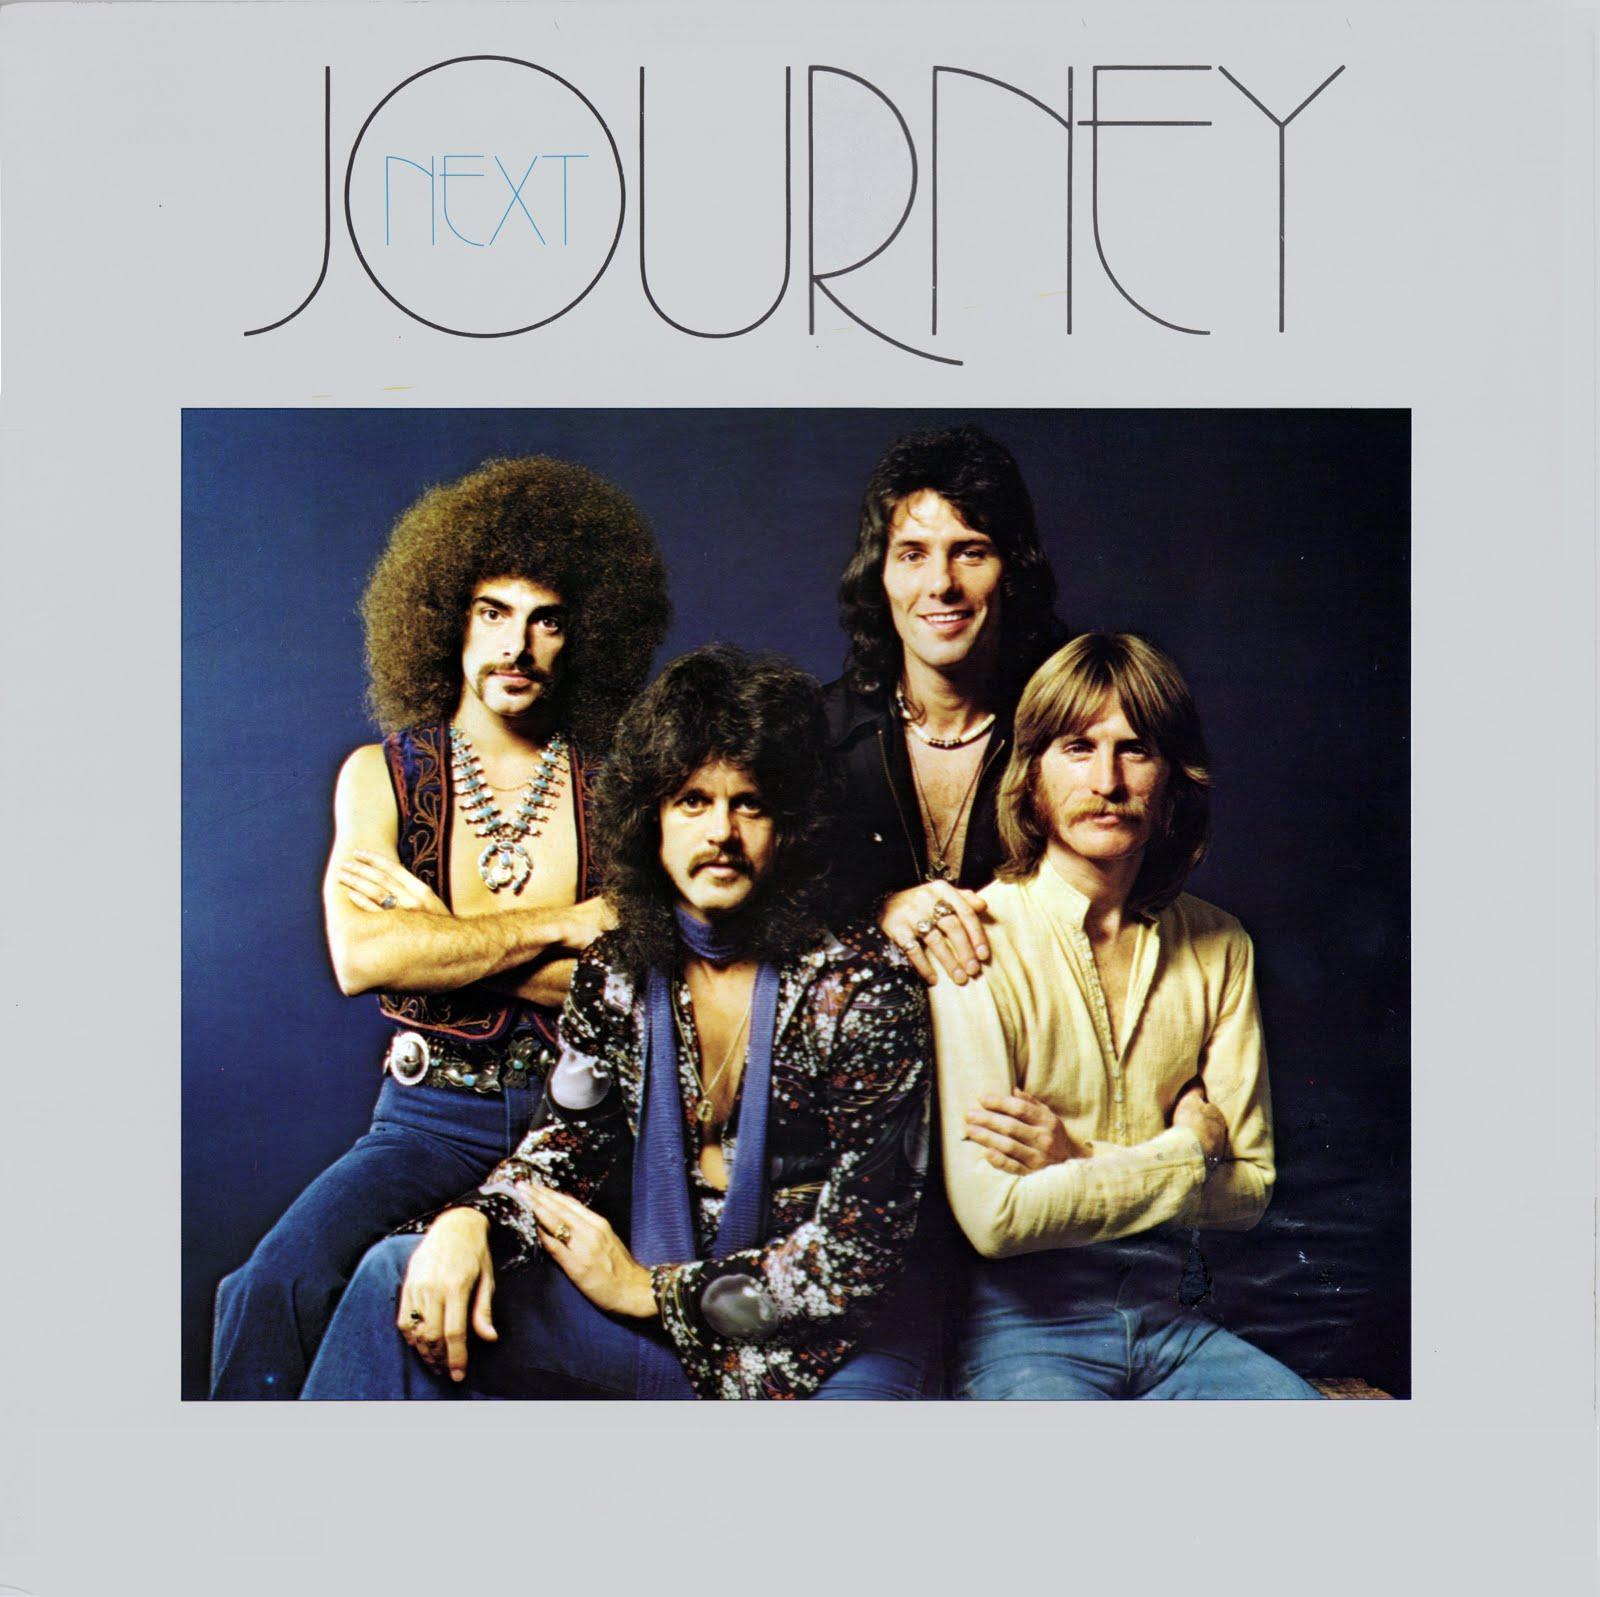 Wheel in the sky journey album retrospective quotnextquot released in february 1977 for Mixtape cd cover